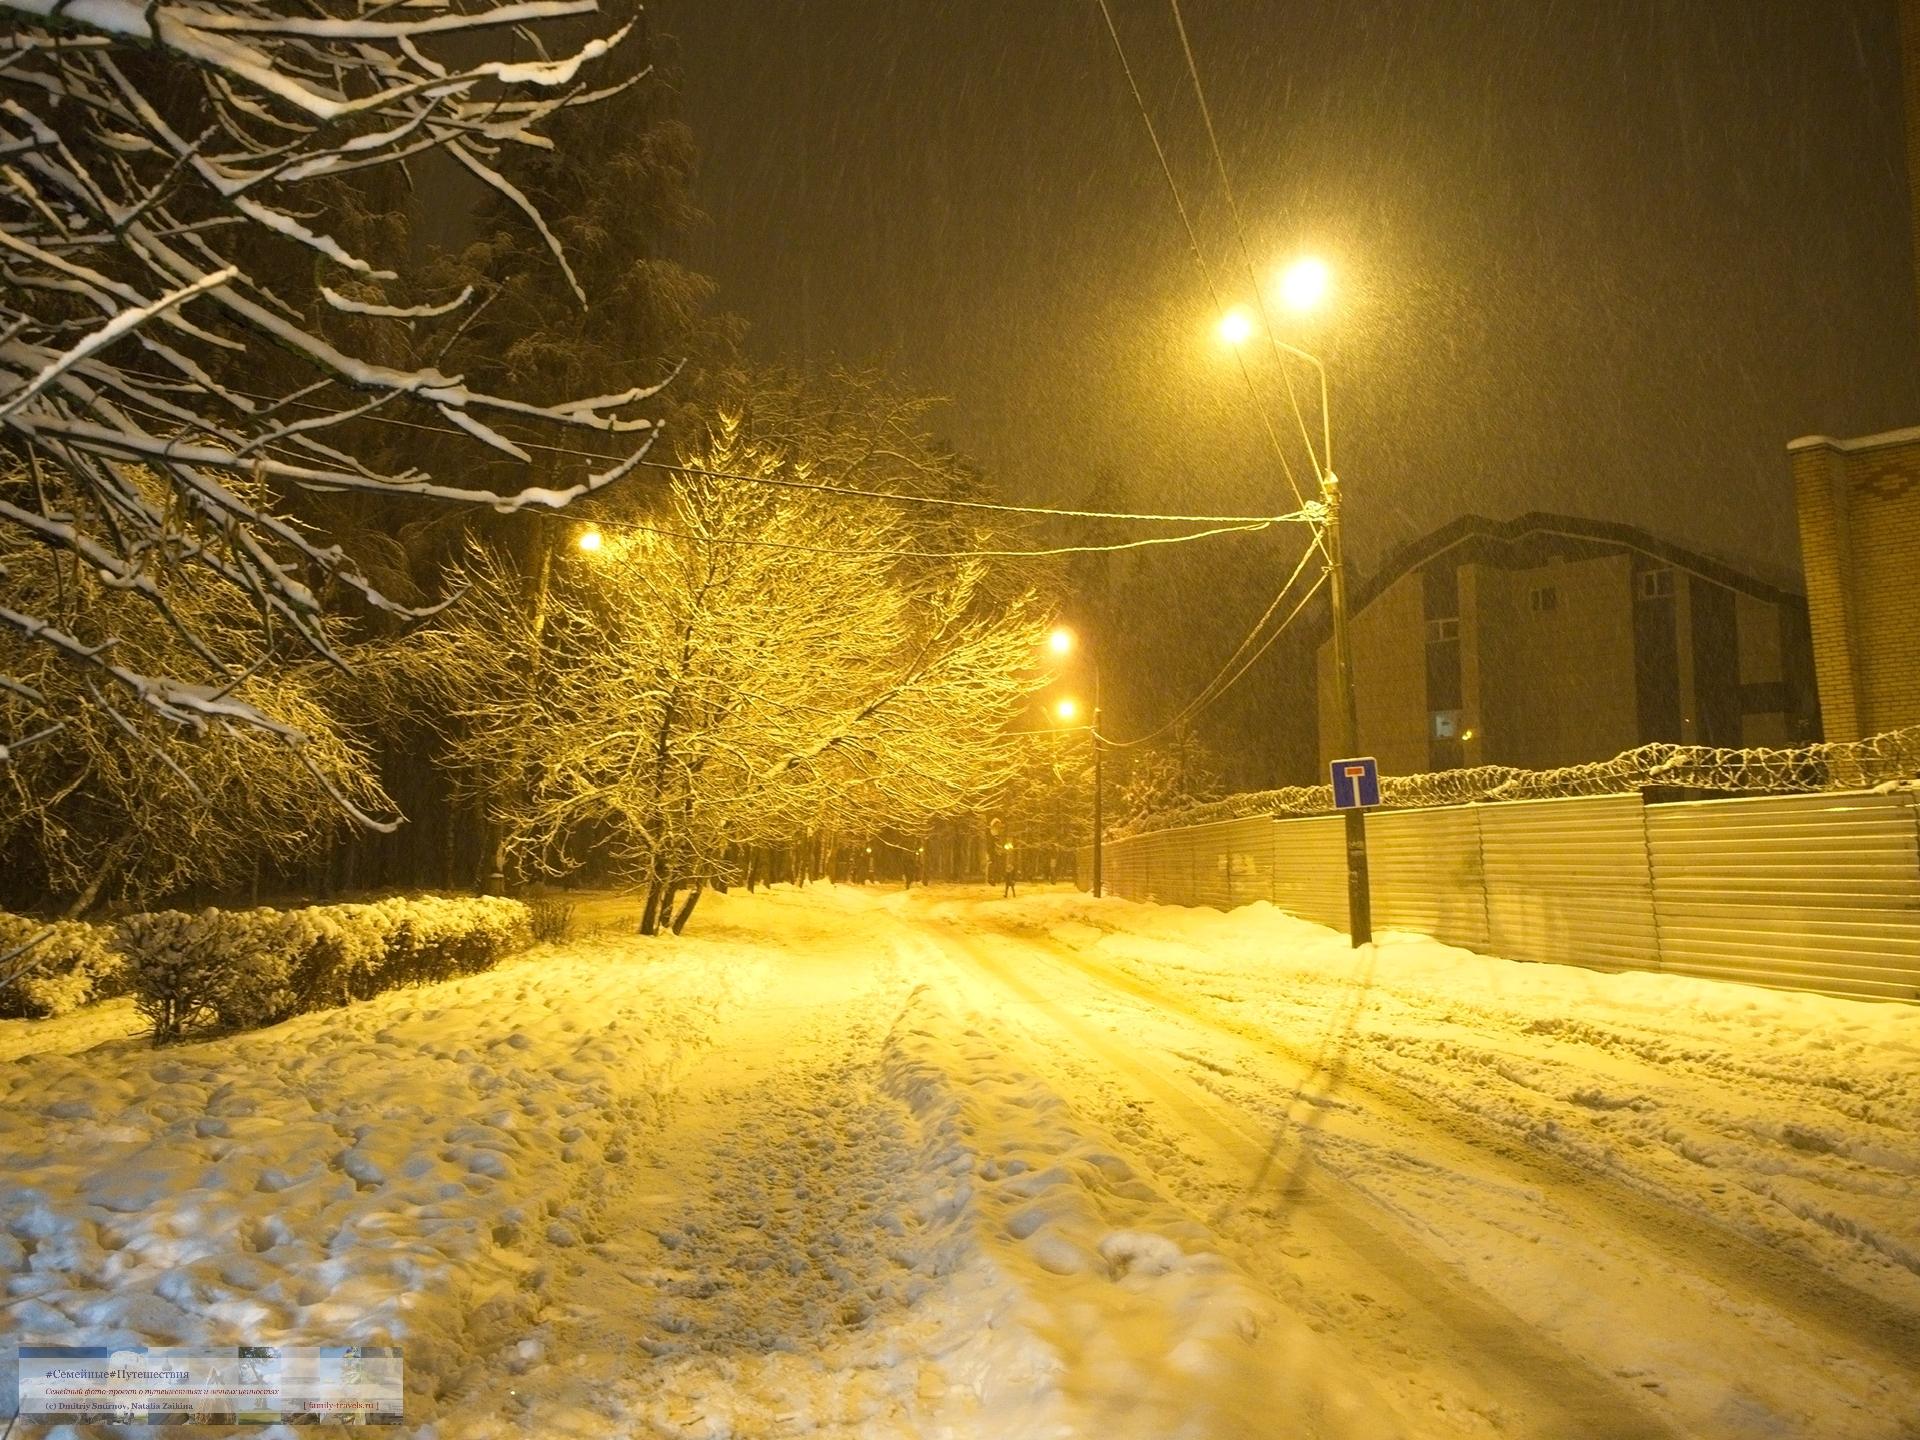 02032018-1900-Blog-060 Просто фото  Снегопад года